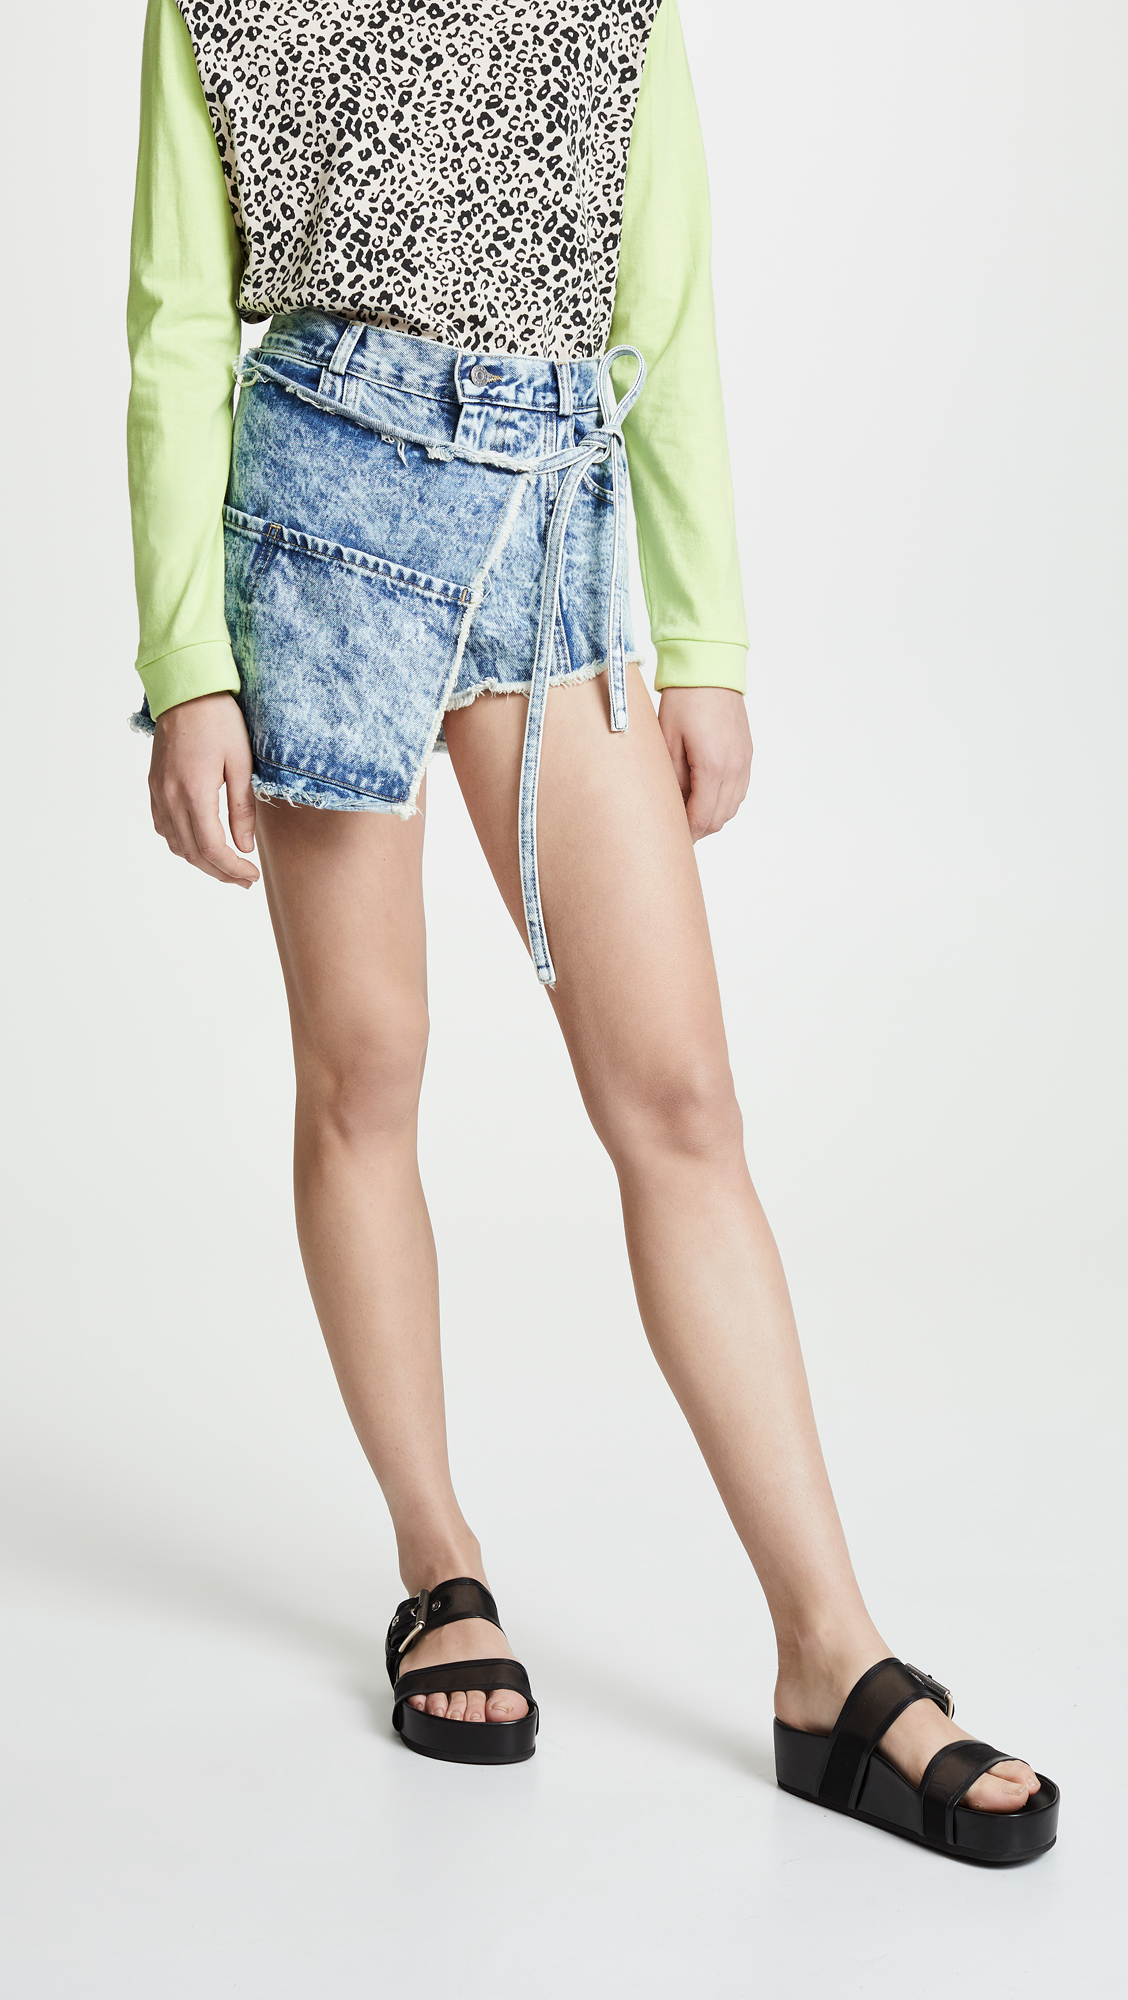 SANDY LIANG Perry Skirt